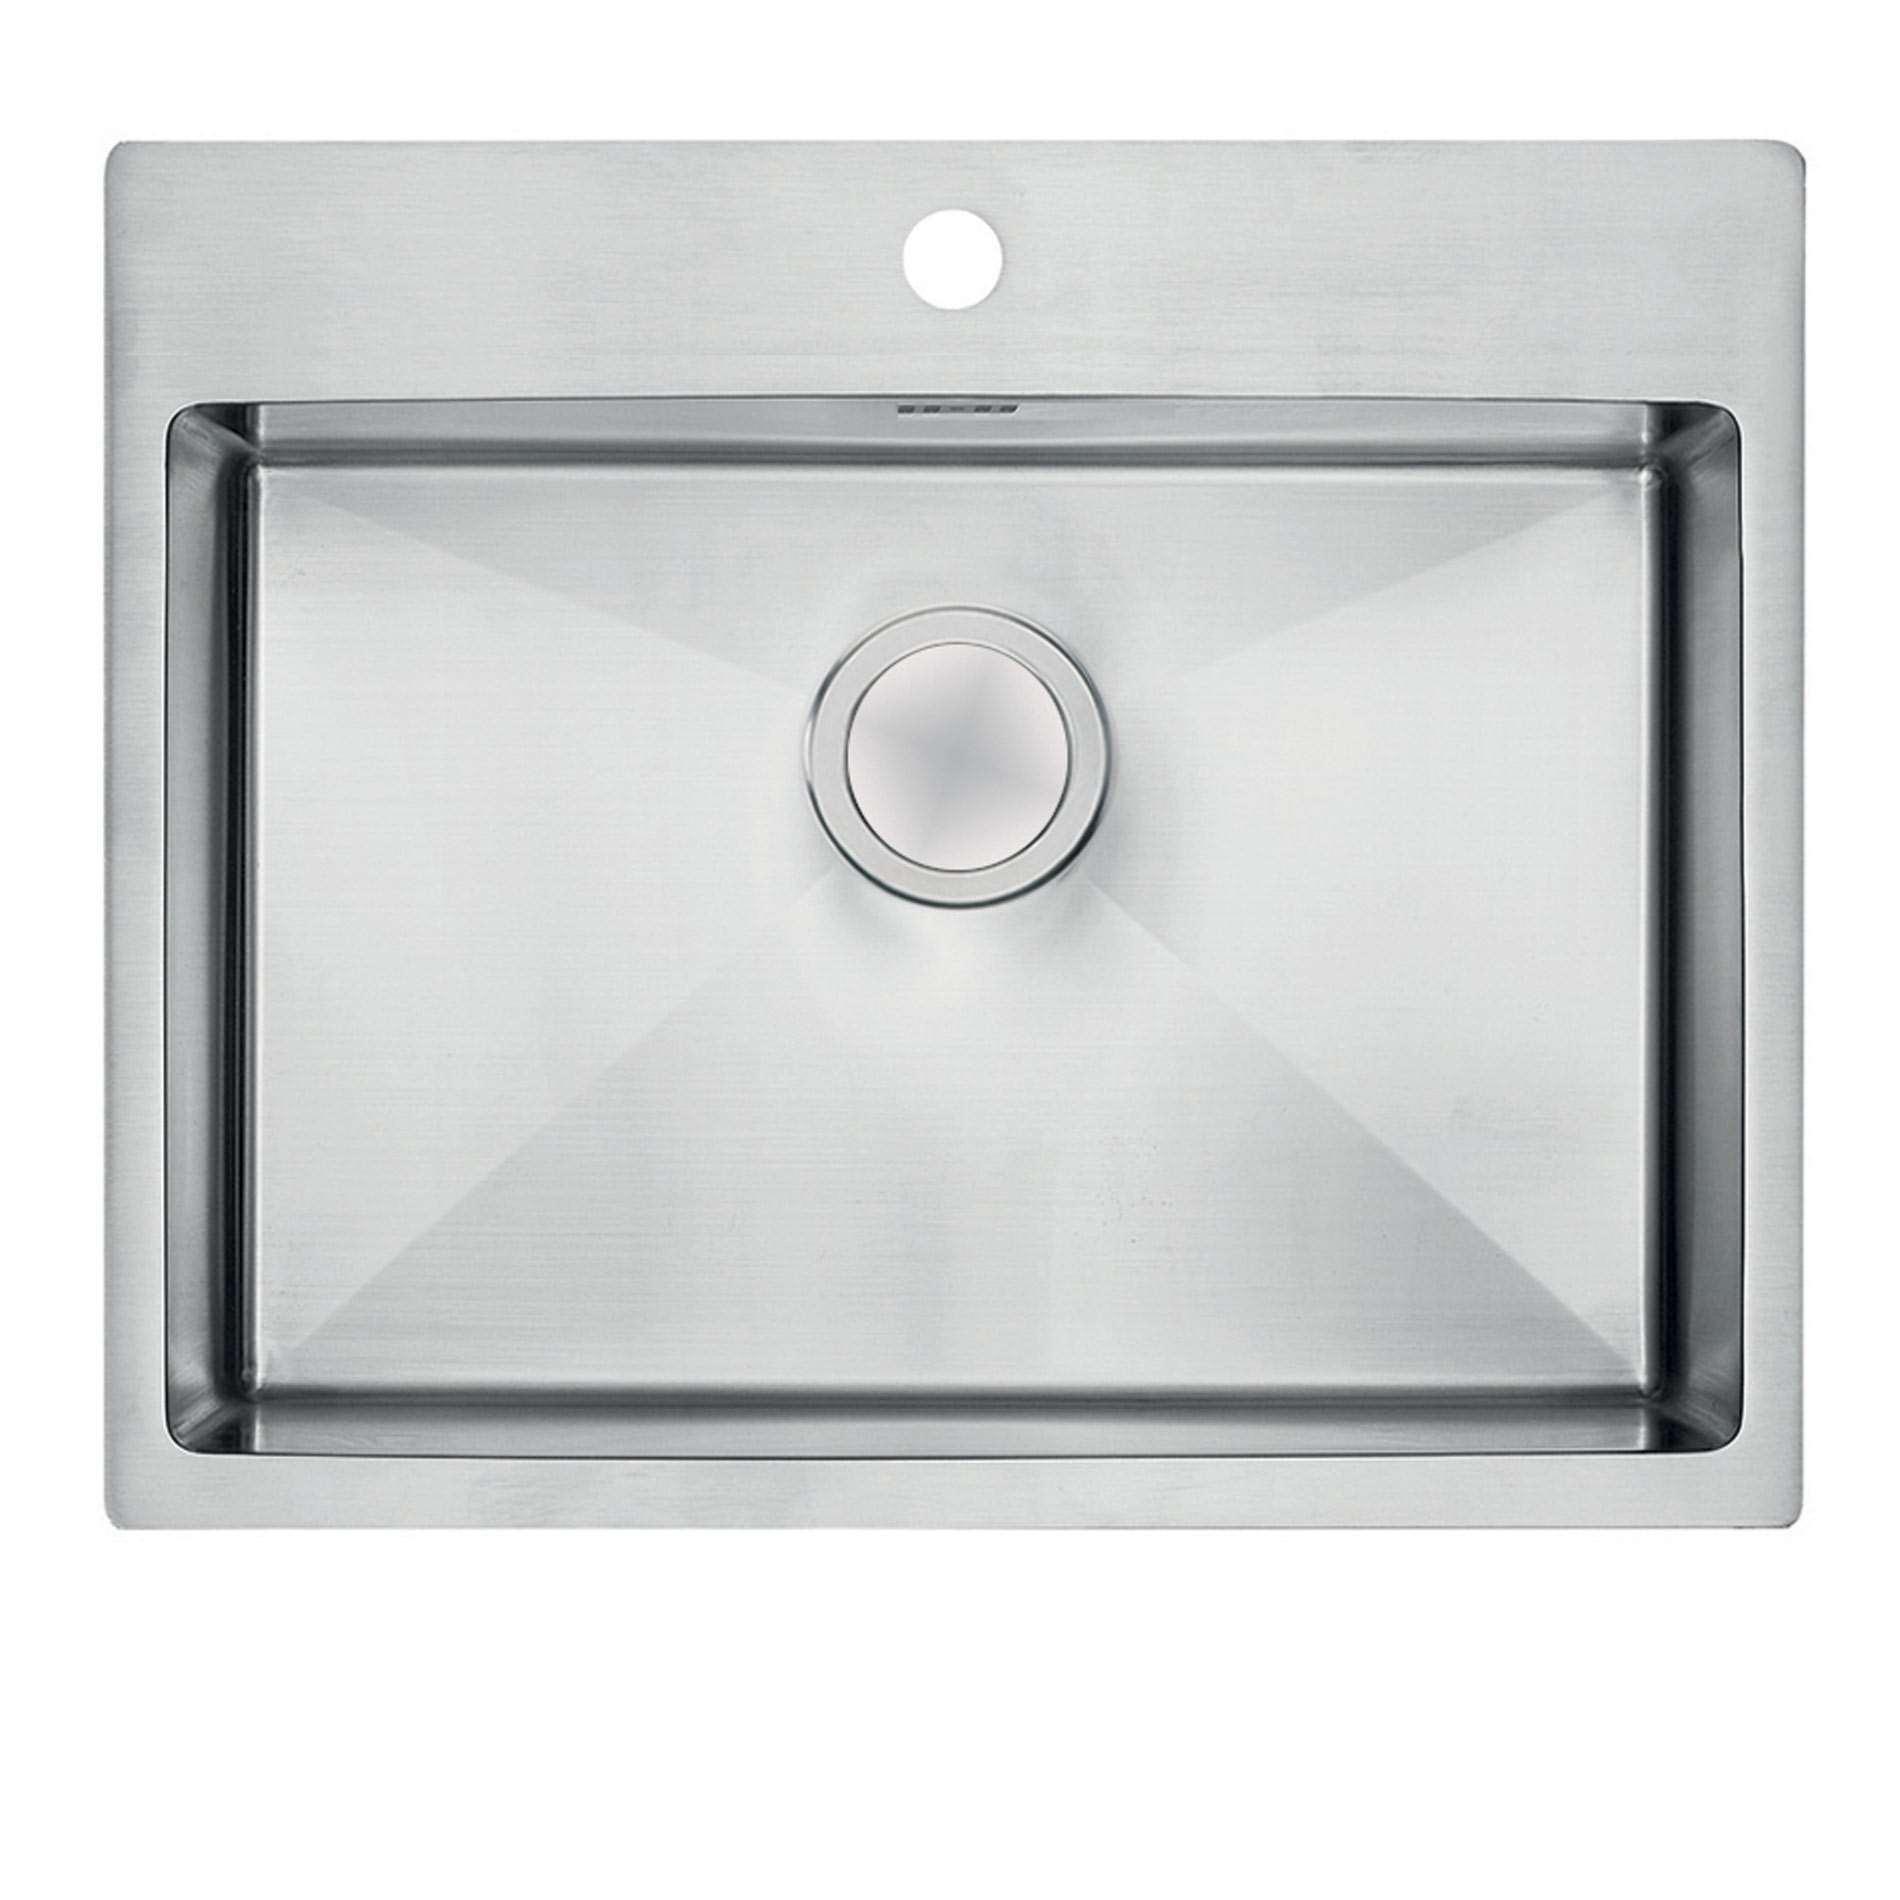 clearwater urban ur660 single bowl stainless steel sink